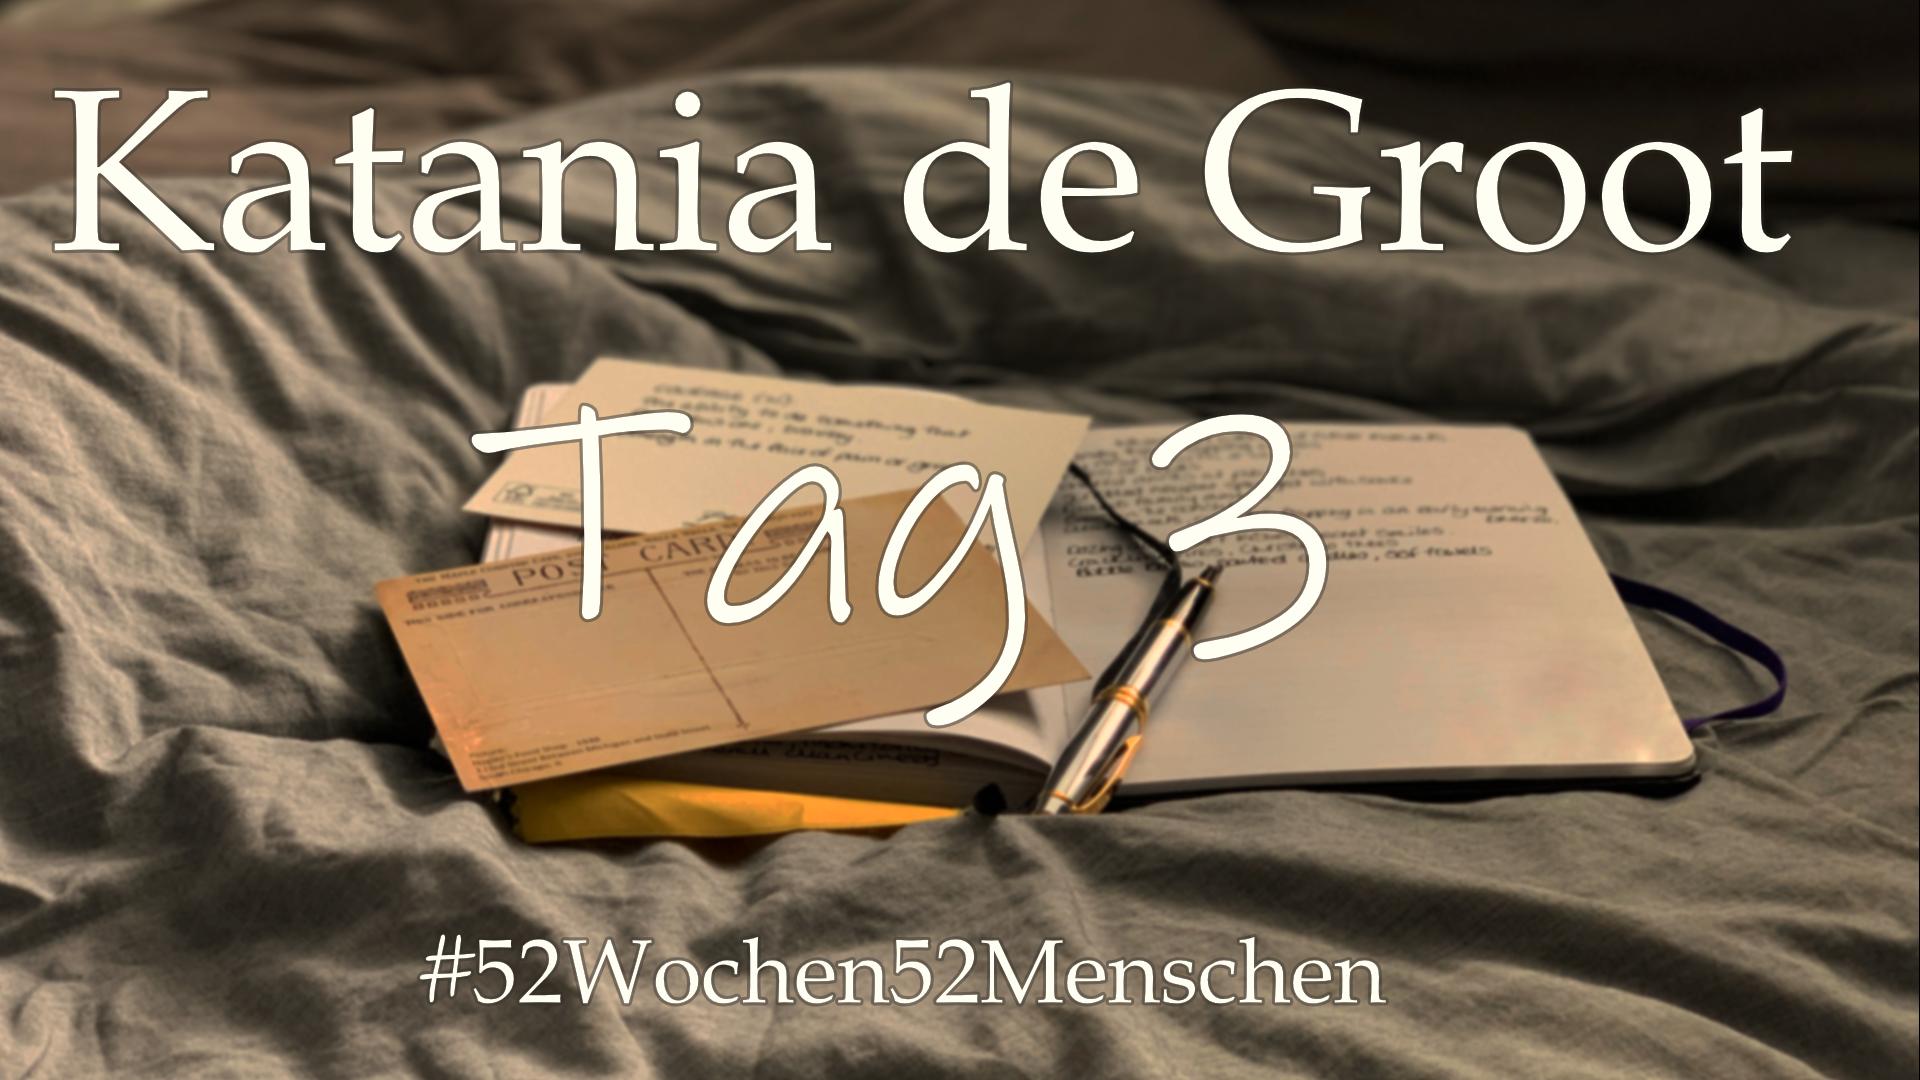 #52Wochen52Menschen: KW5 – Katania de Groot – Tag 3